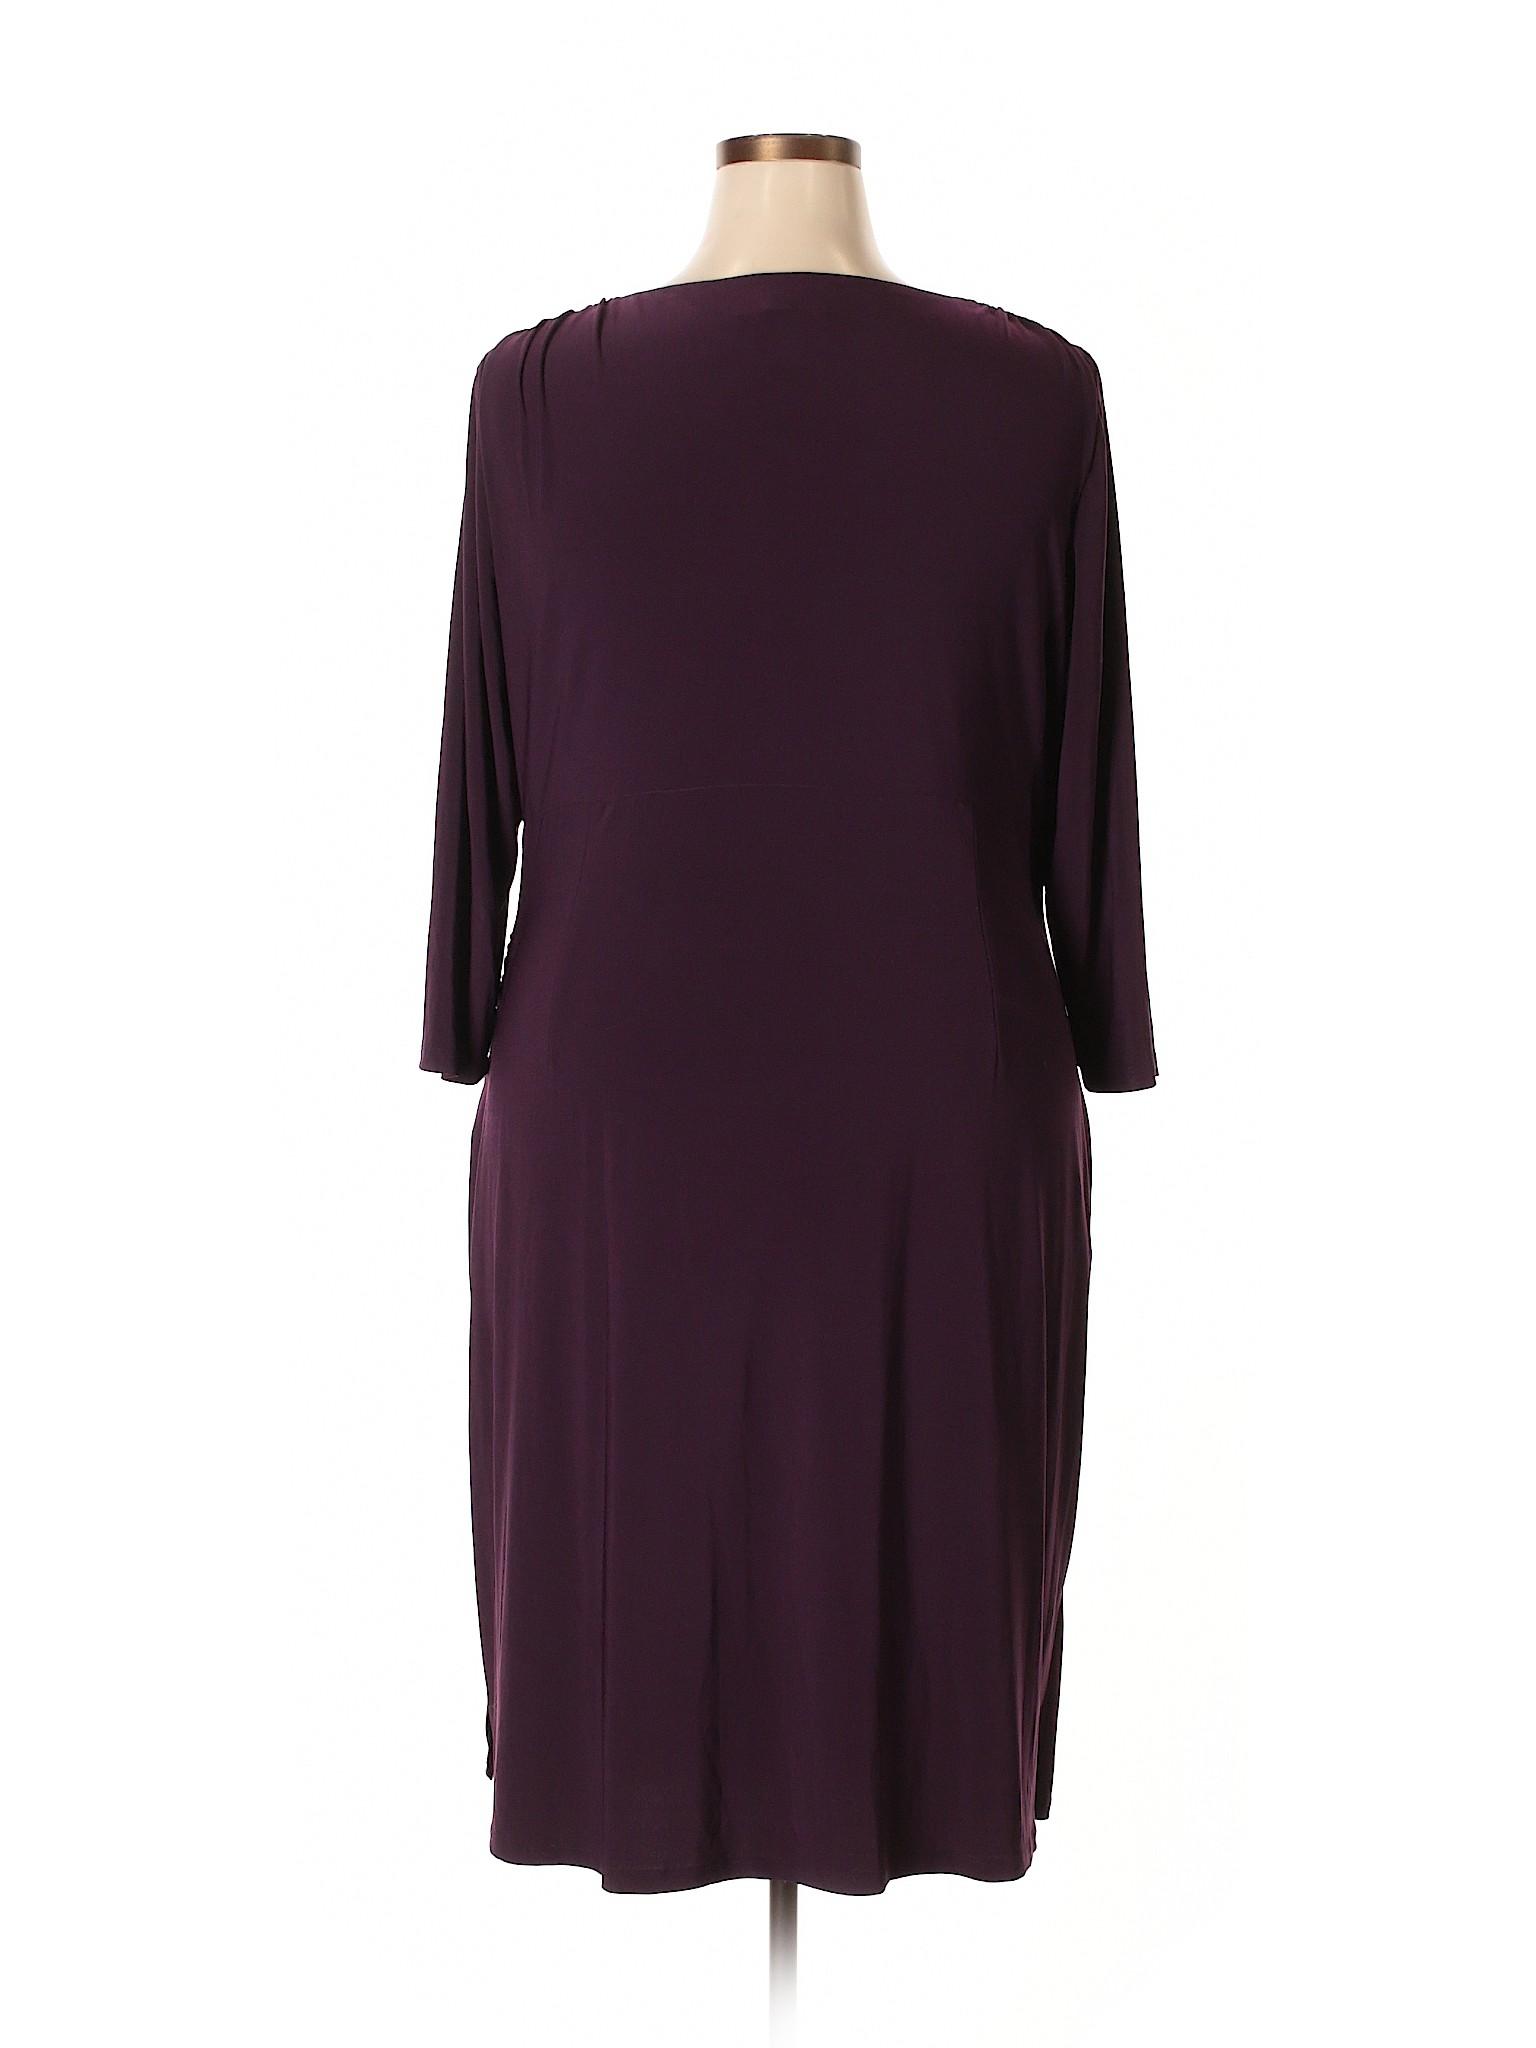 by Boutique Casual Lauren winter Dress Lauren Ralph w1fvq01